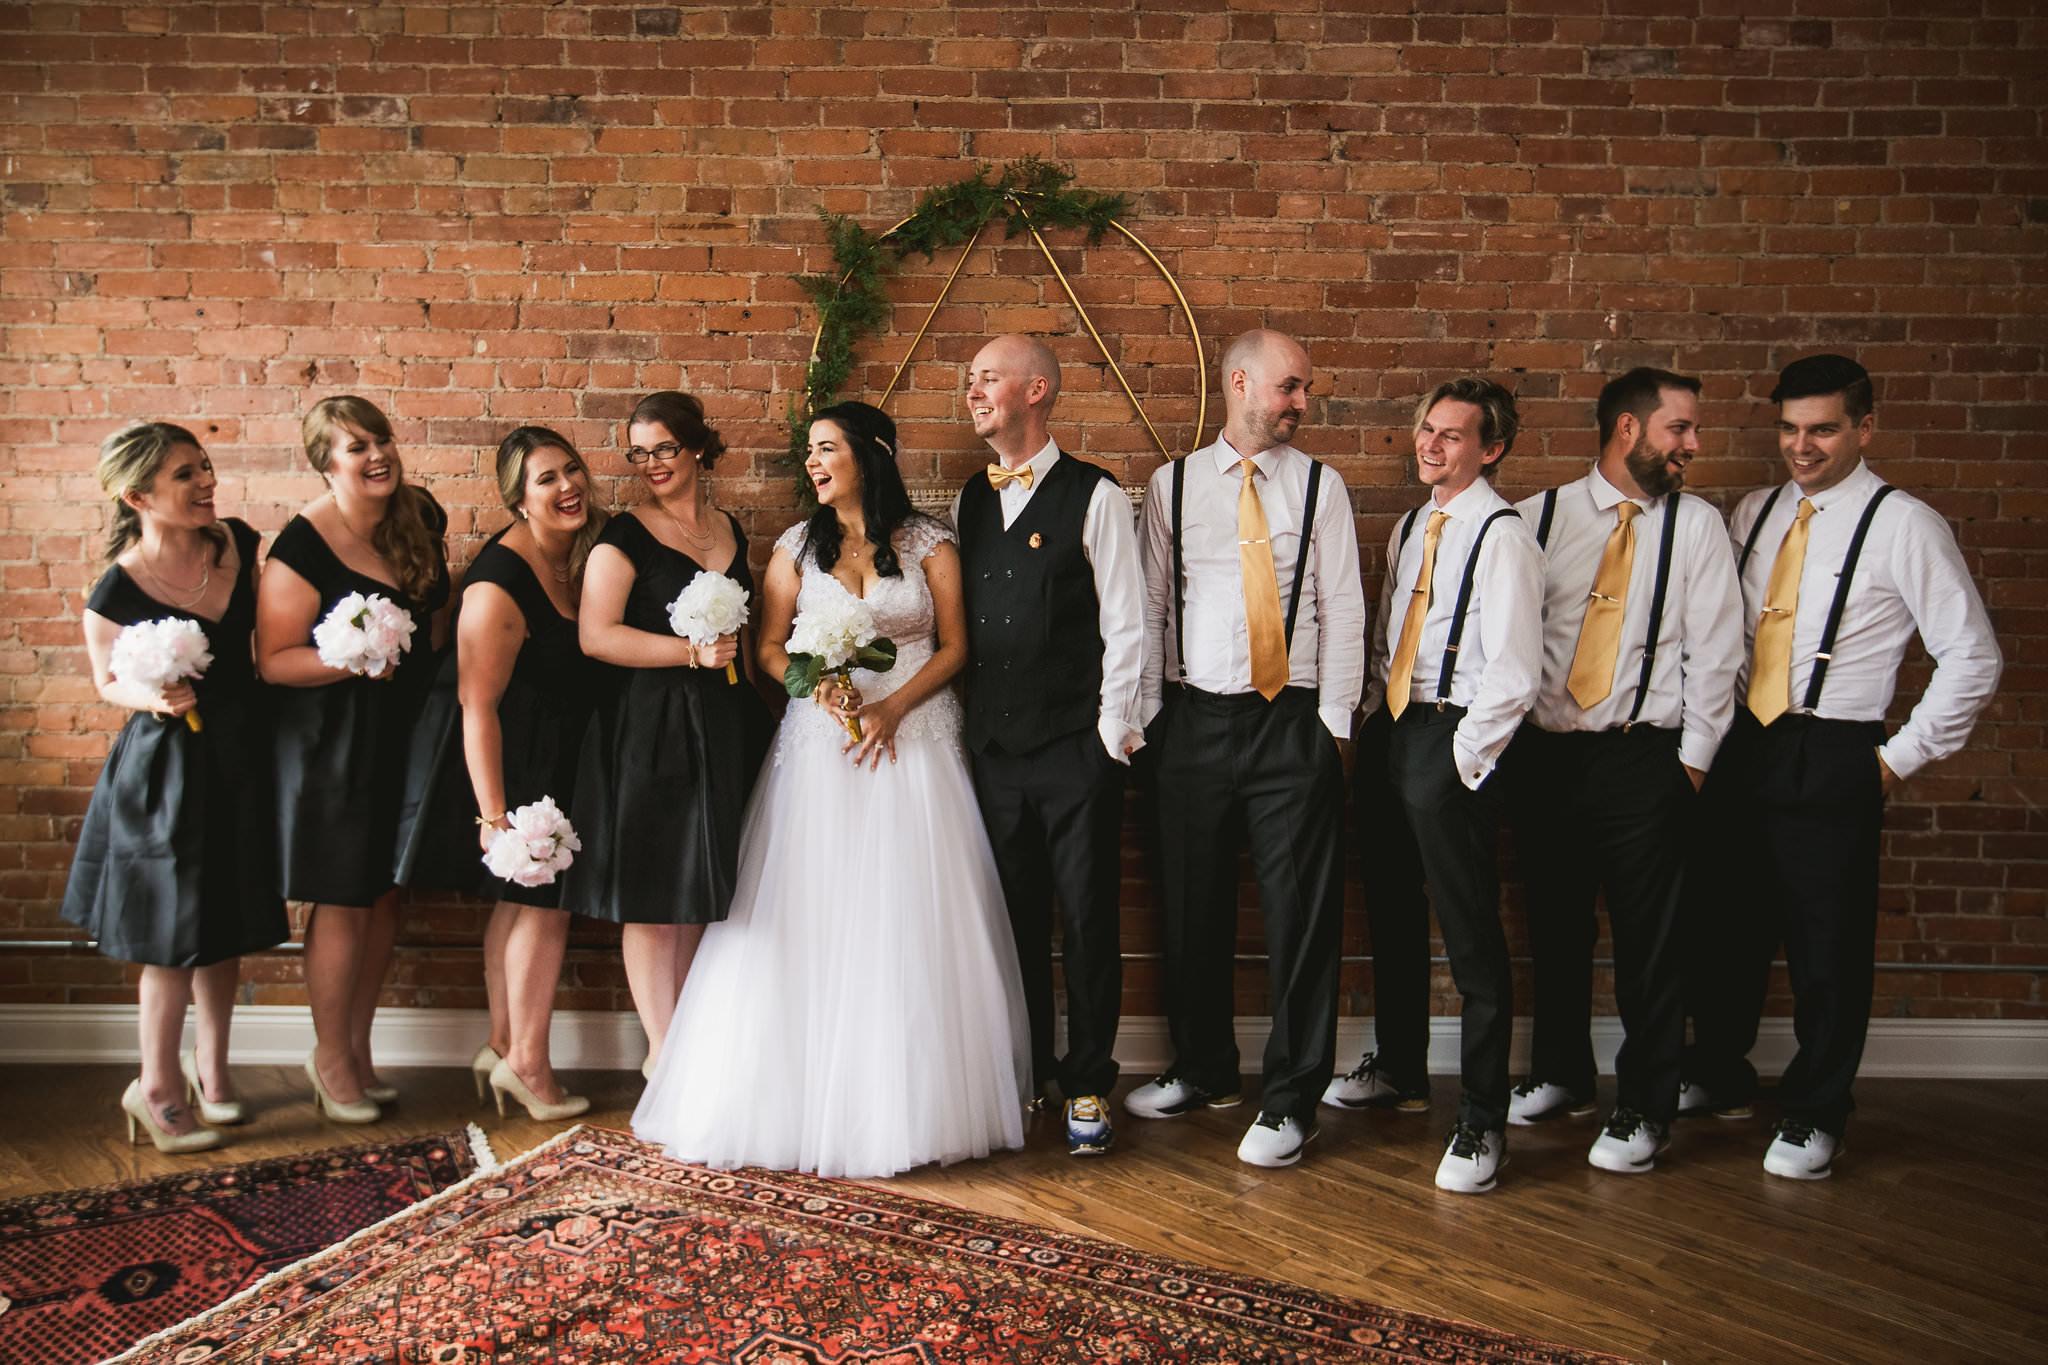 Kristen Adam Kindred Loft Whitby Wedding Photos 259 - Durham Wedding Photographer: Kindred Loft Wedding Photos